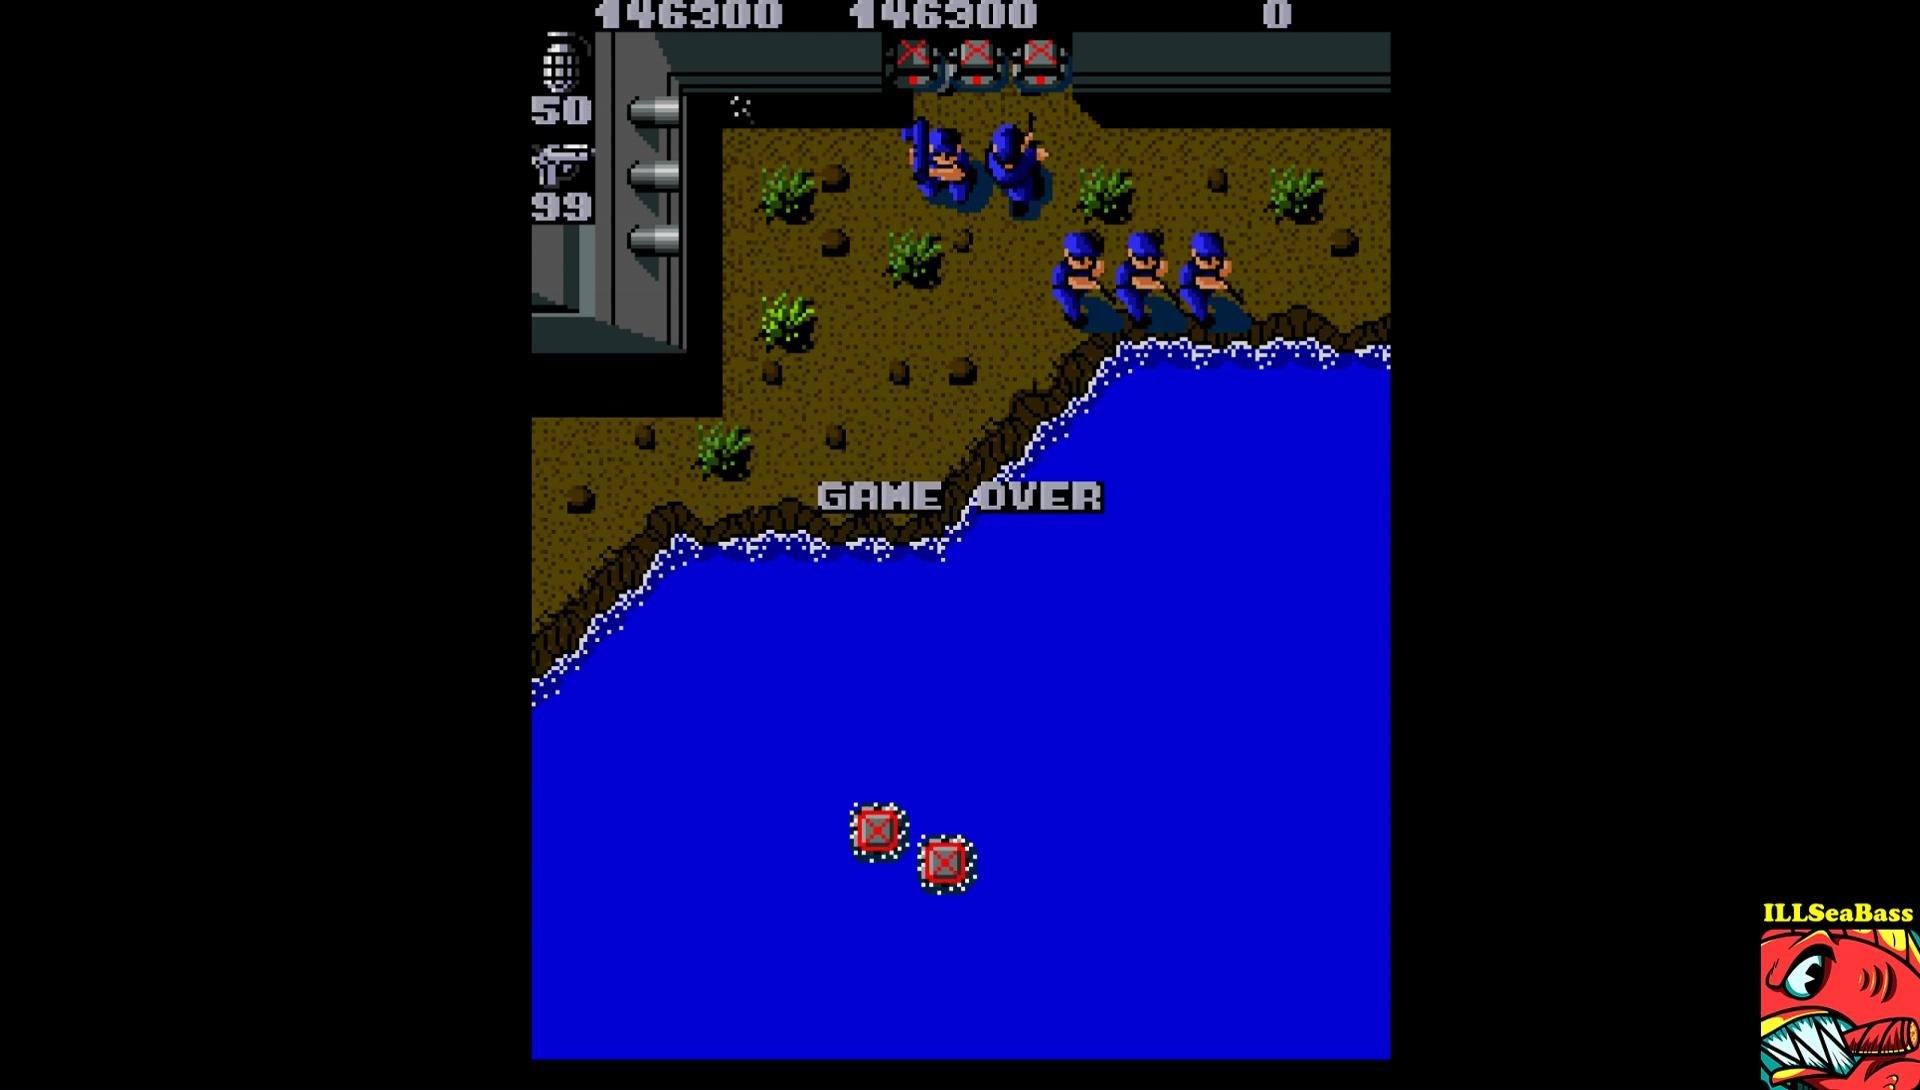 ILLSeaBass: SNK Arcade Classics 0: Ikari Warriors (PSP Emulated) 146,300 points on 2017-02-20 10:39:51